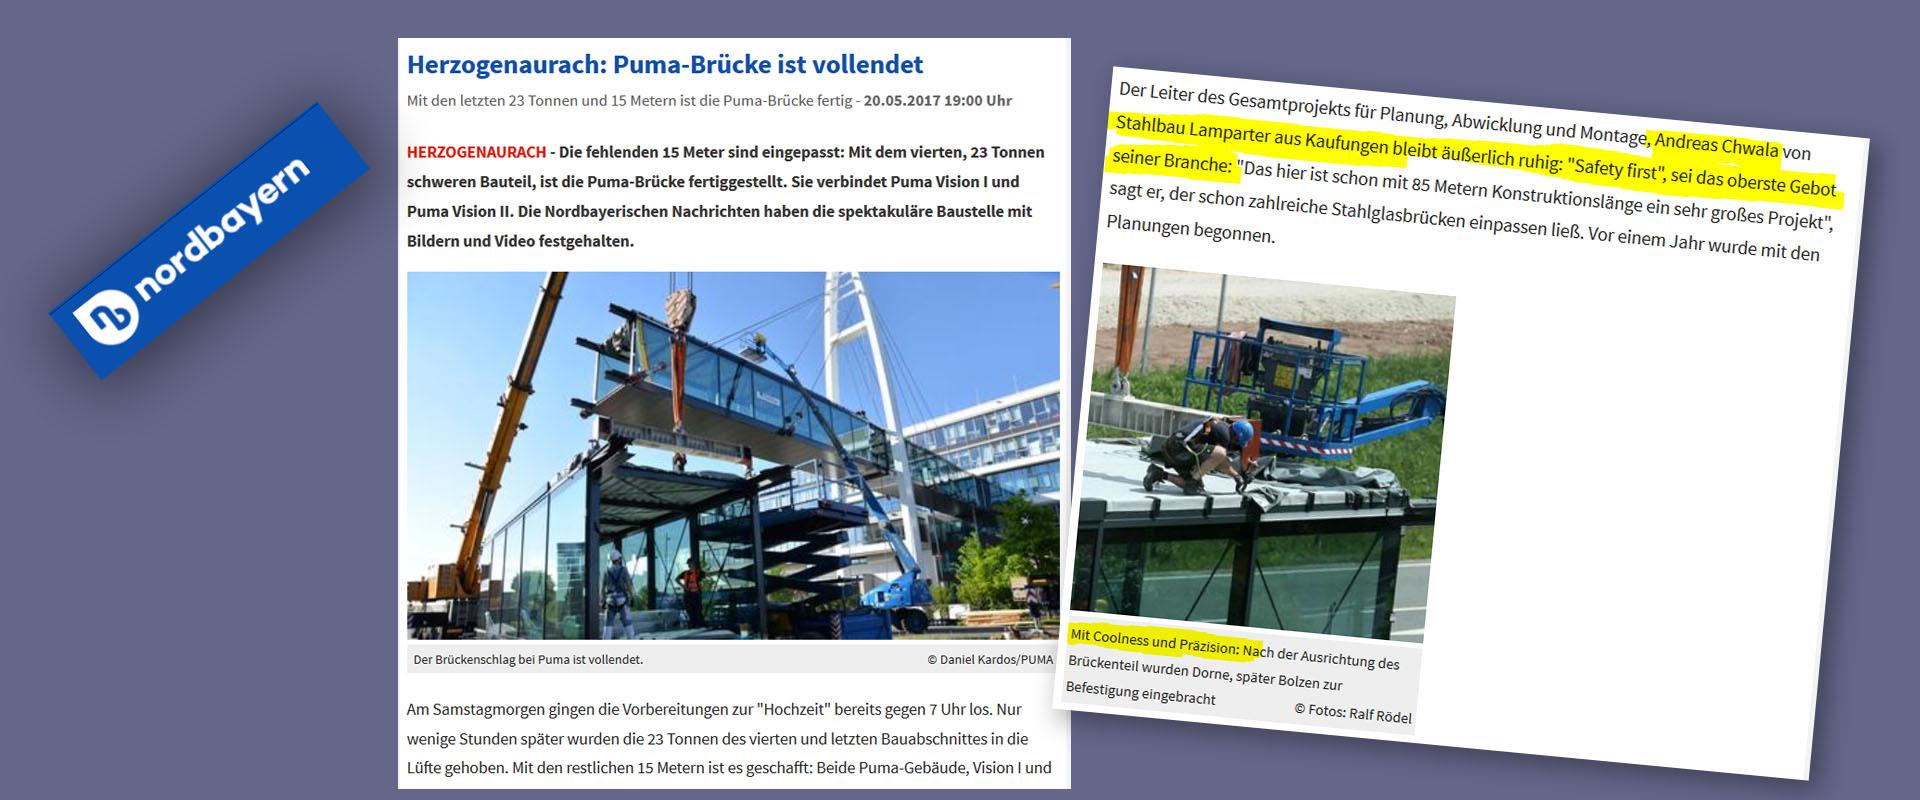 Medien über Stahlbau Lamparter. Puma Brücke Bridge Verbindungsbrücke